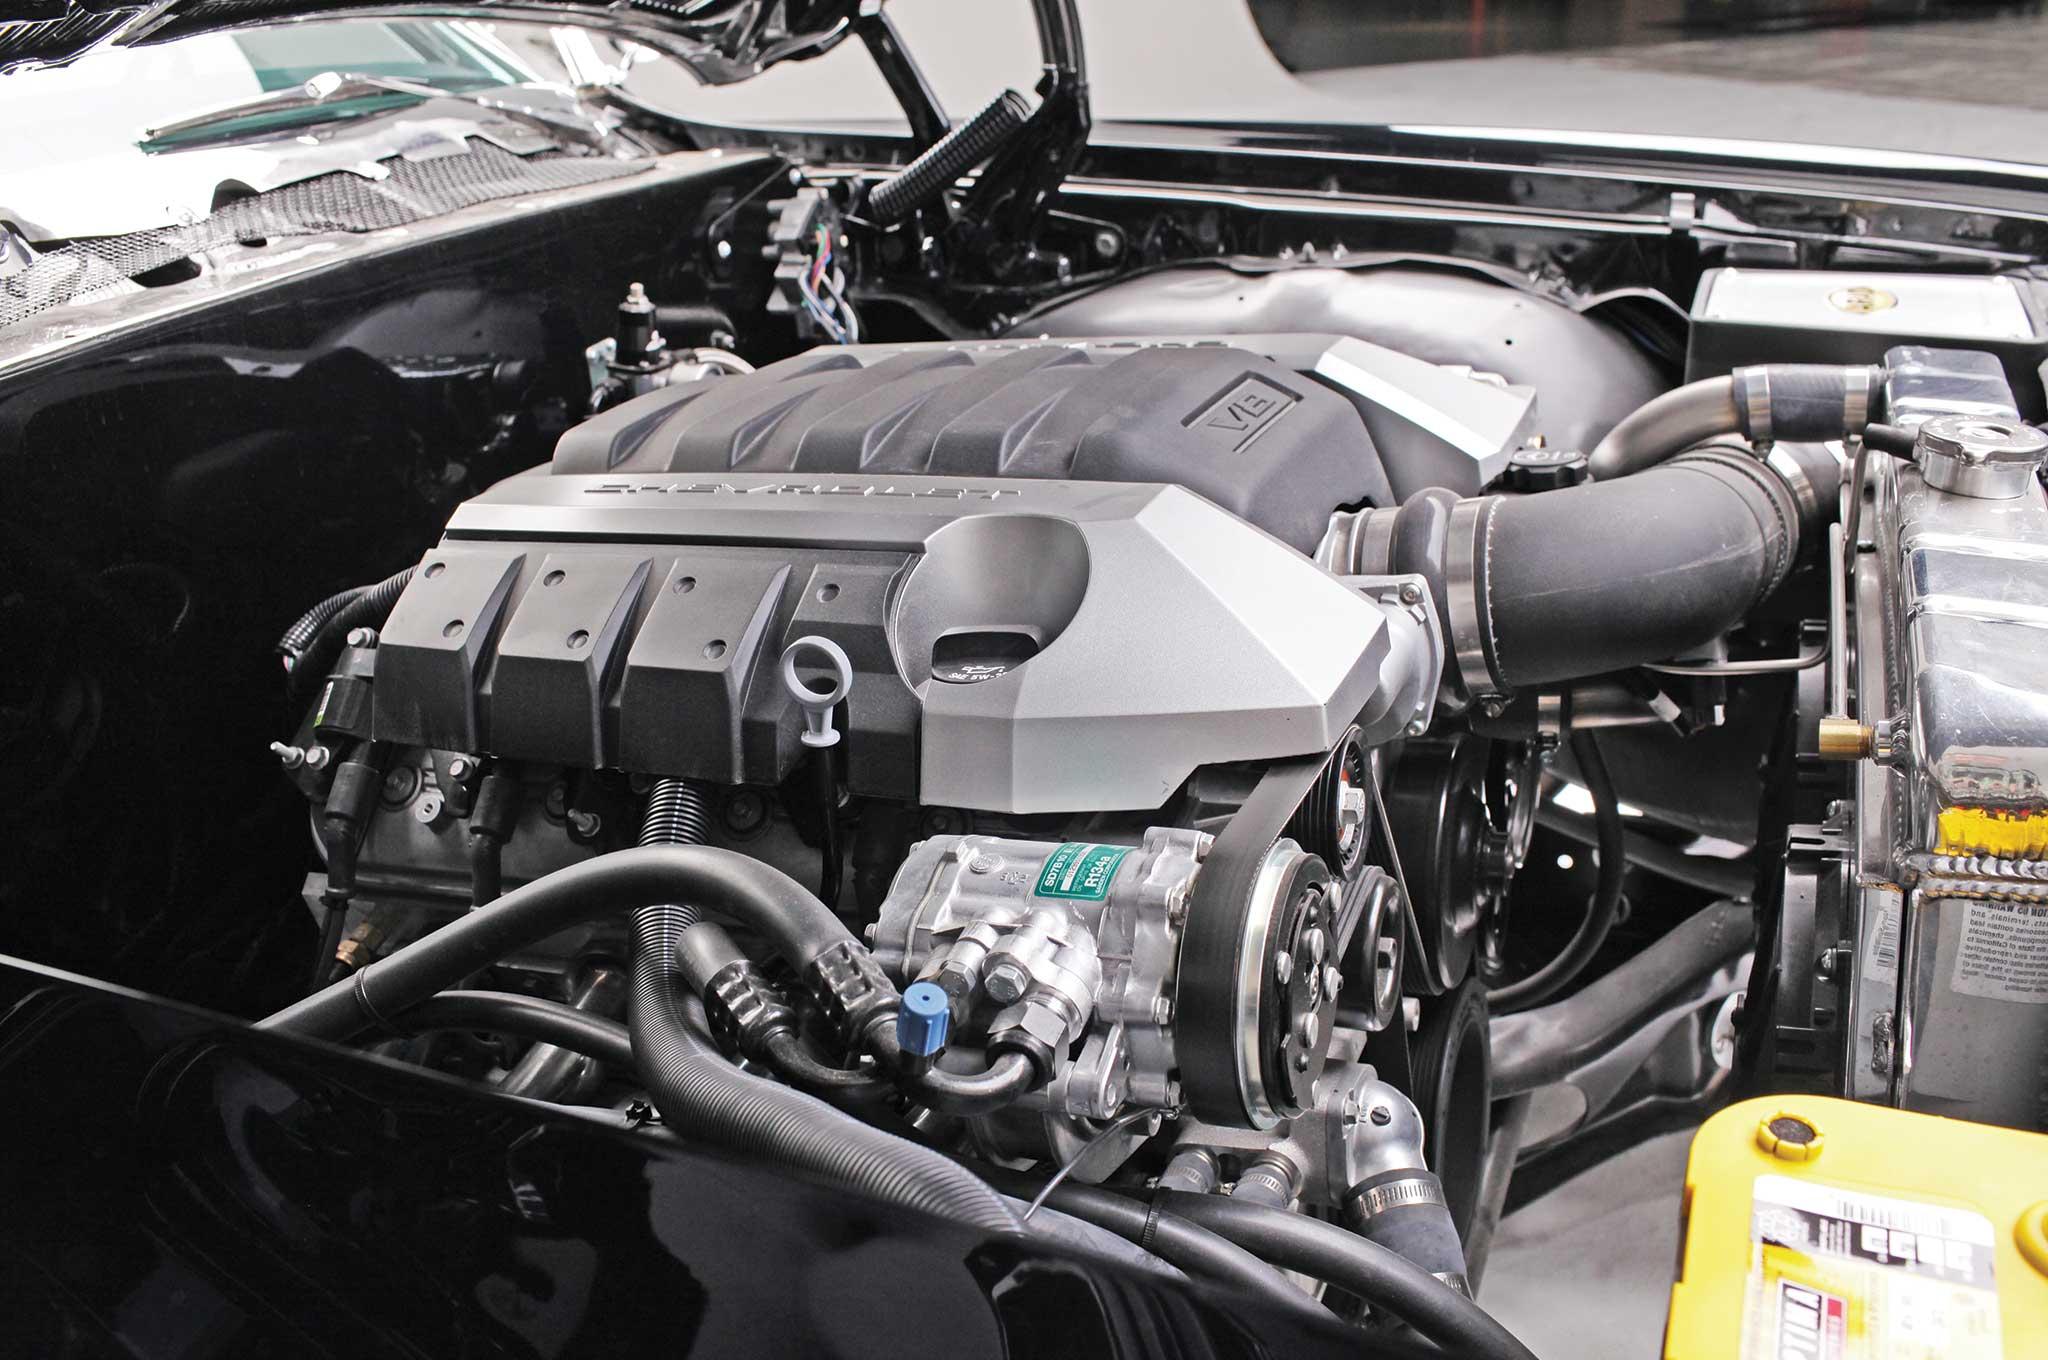 1968-chevrolet-impala-ss-ls3-engine